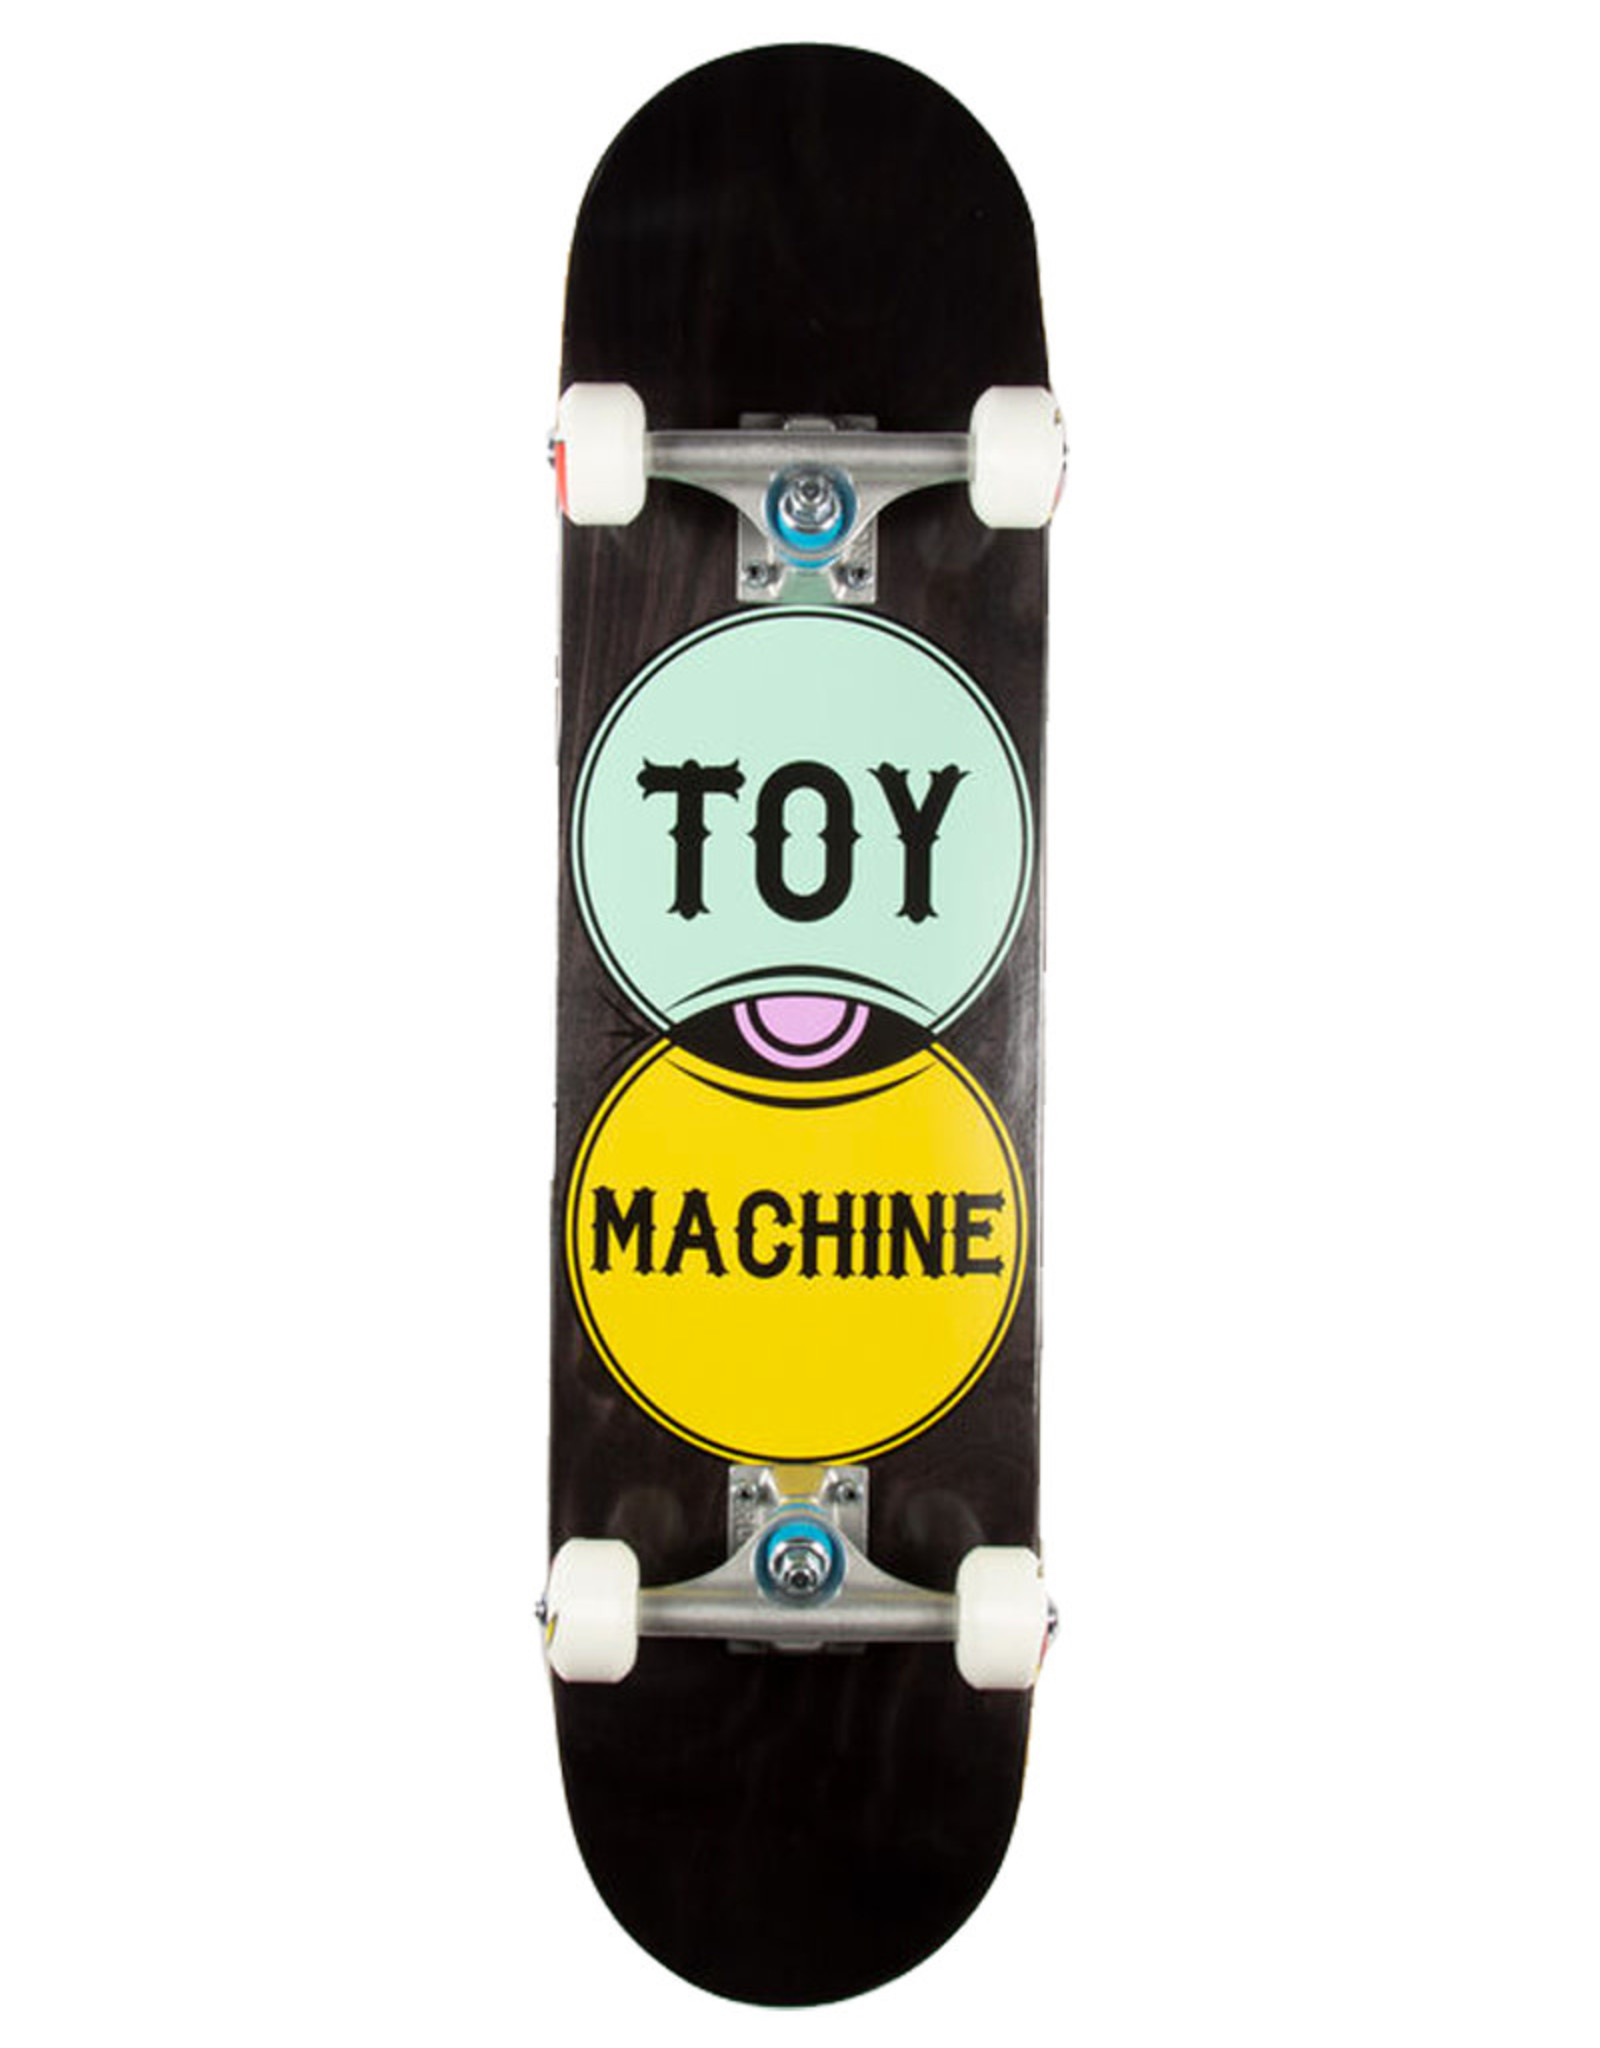 Toy Machine Toy Machine Complete Vendiagram (7.75)